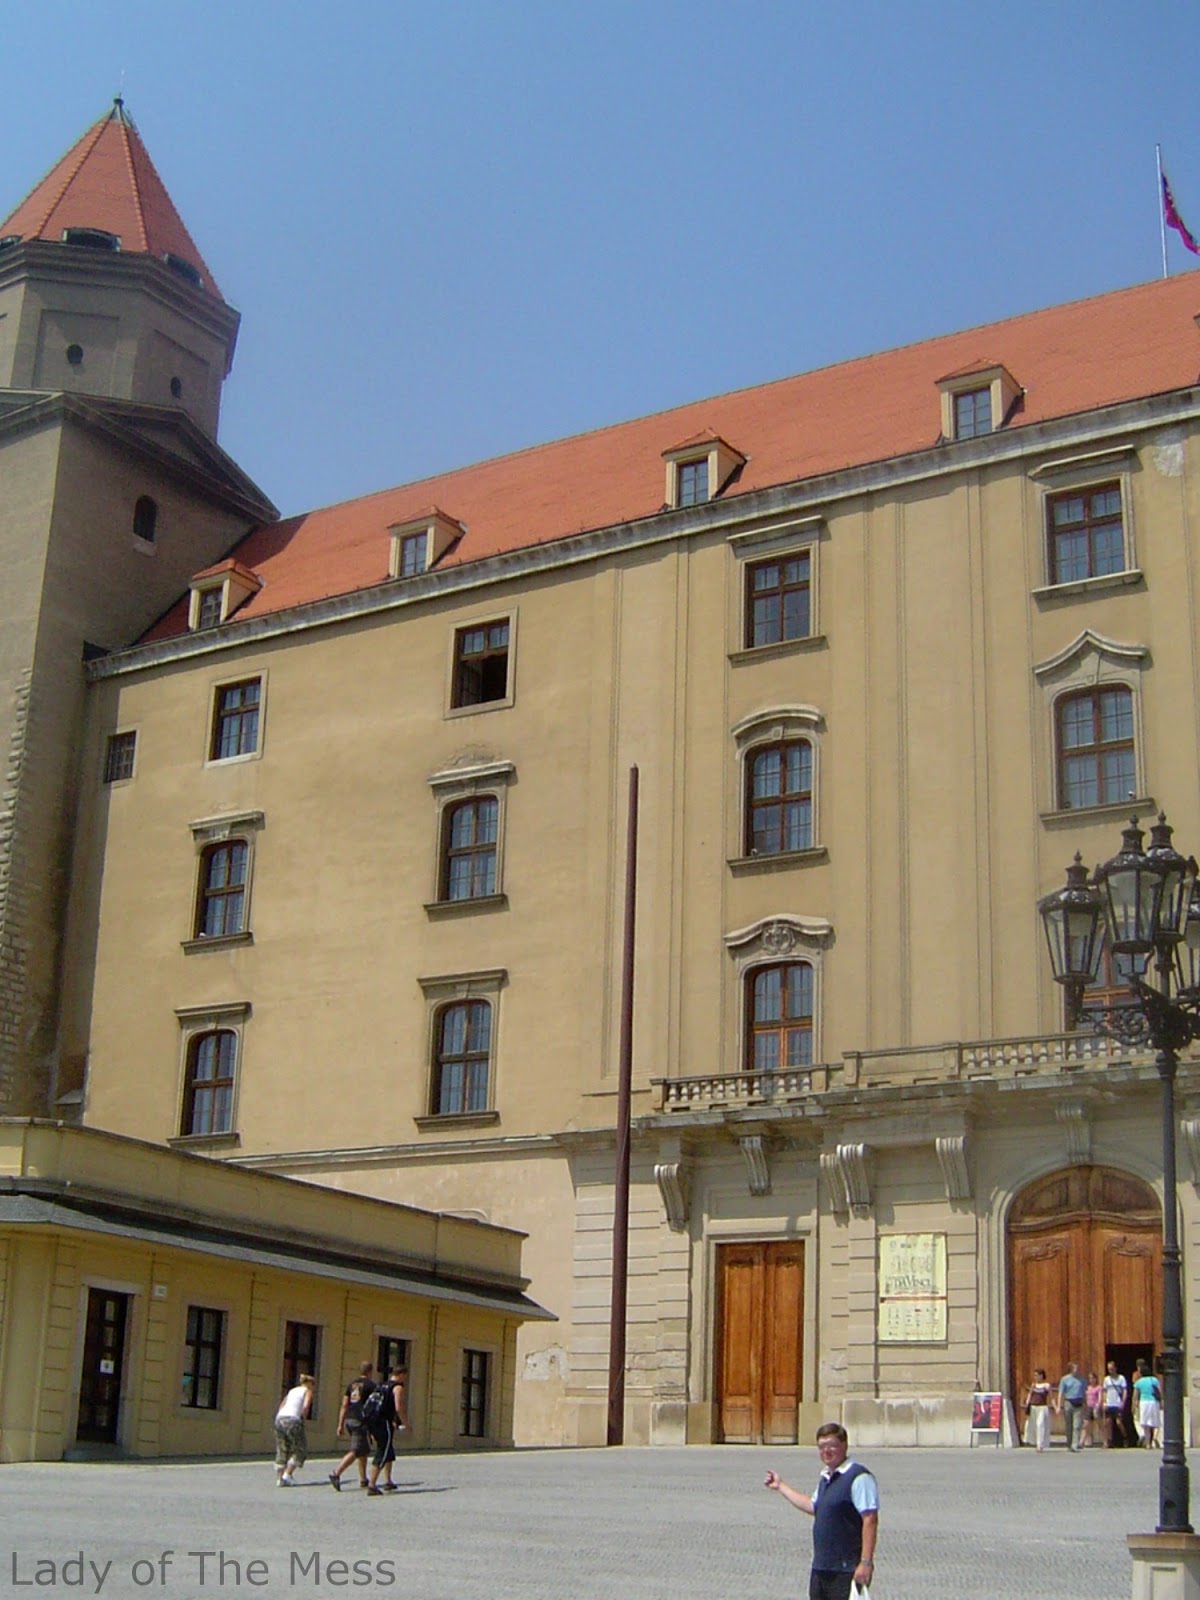 Bratislavan linna, loma